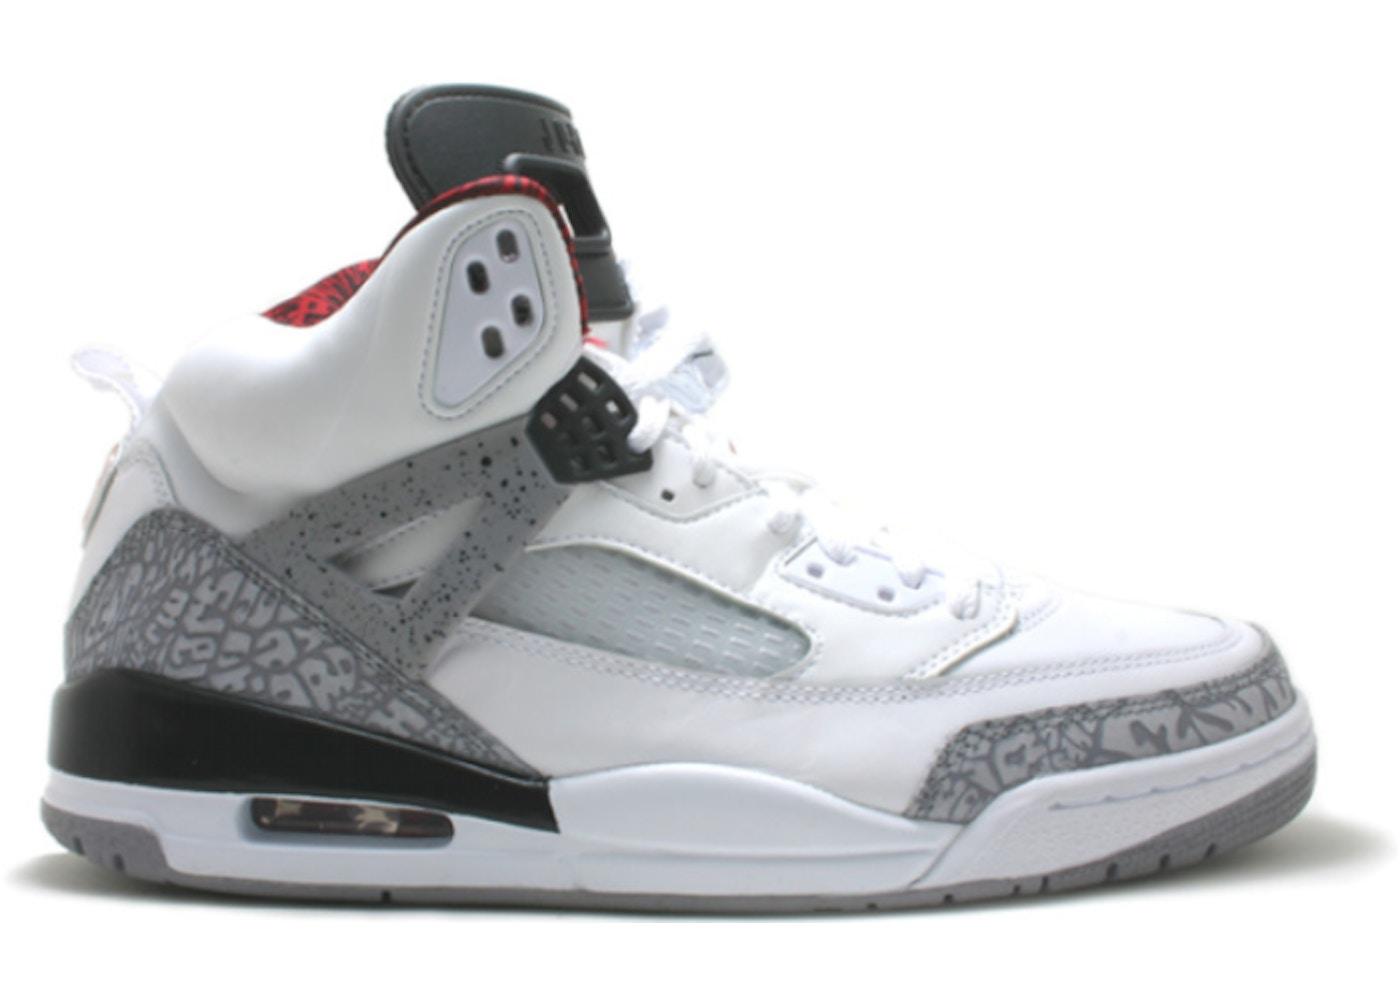 Jordan Spiz'ike Cement White Cement Jordan White Spiz'ike Grey Grey 3RA5jLq4